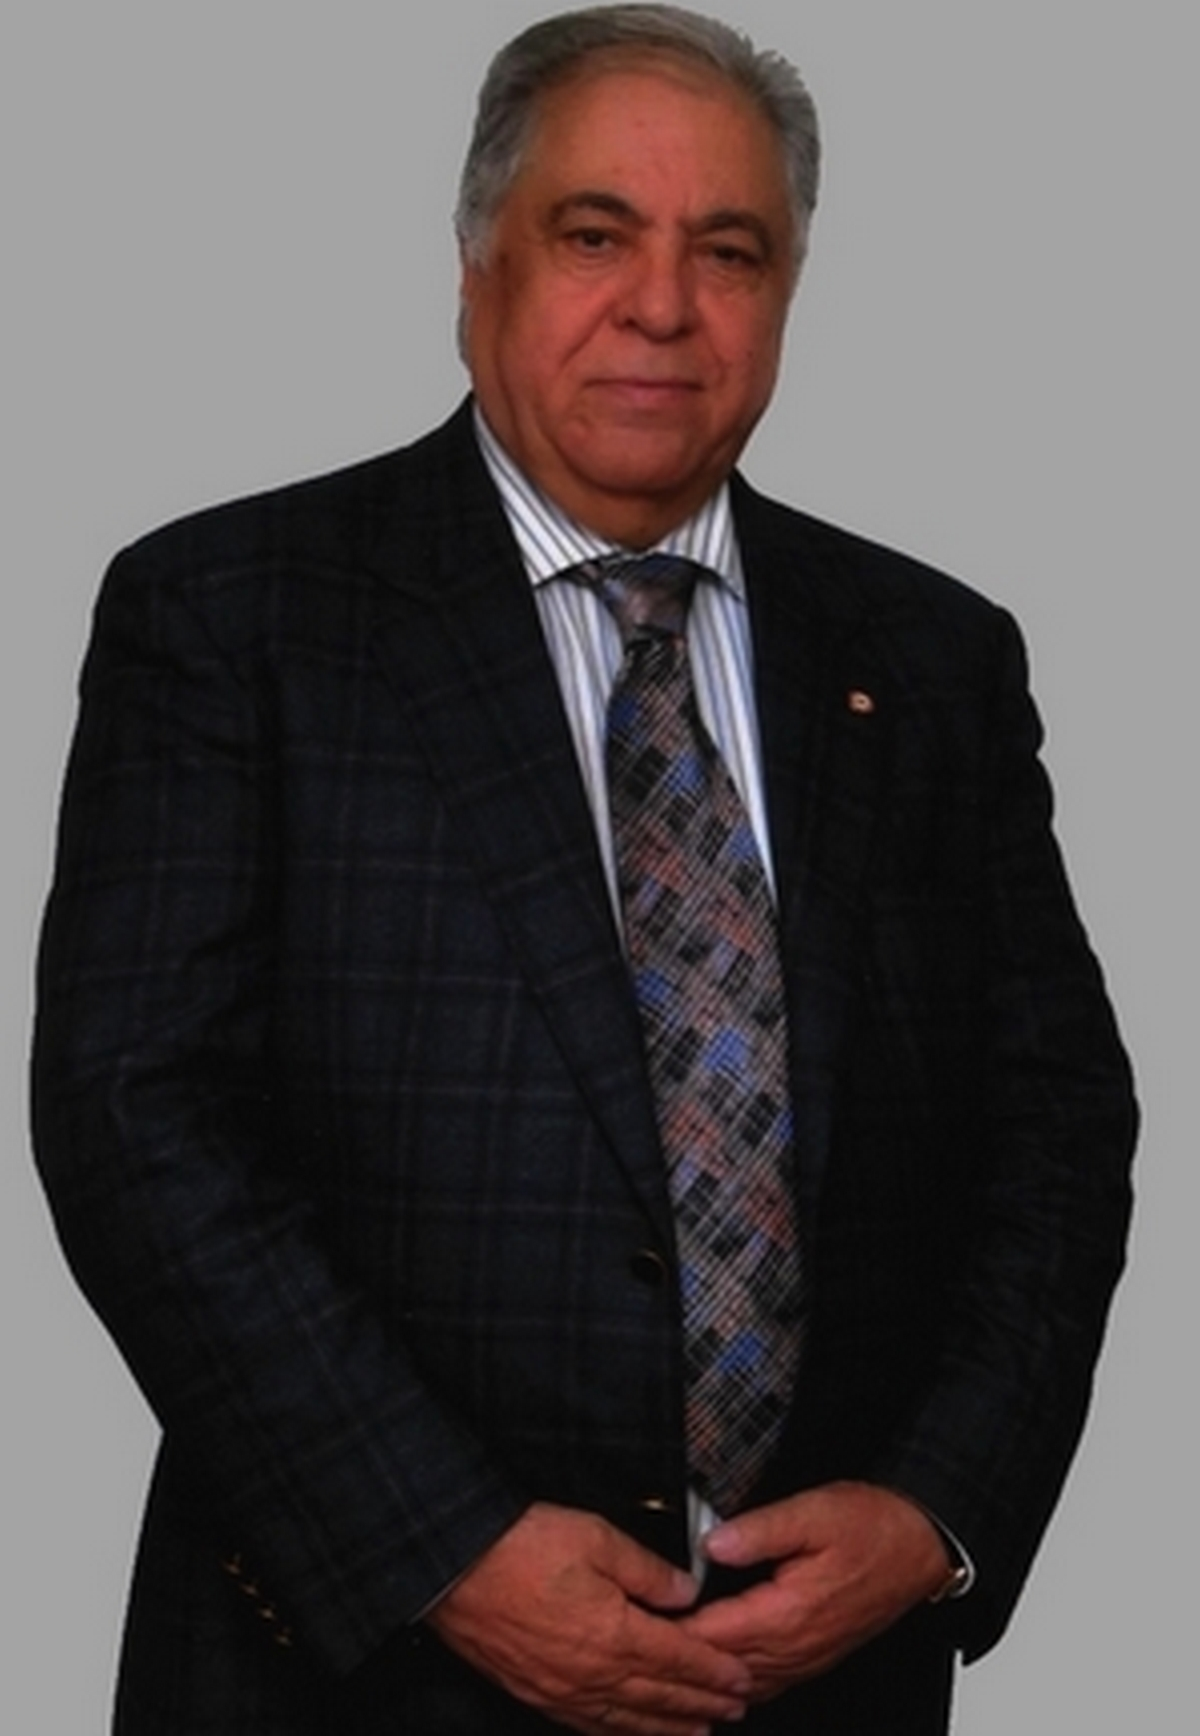 Abdelaly Ouazzani Touhami